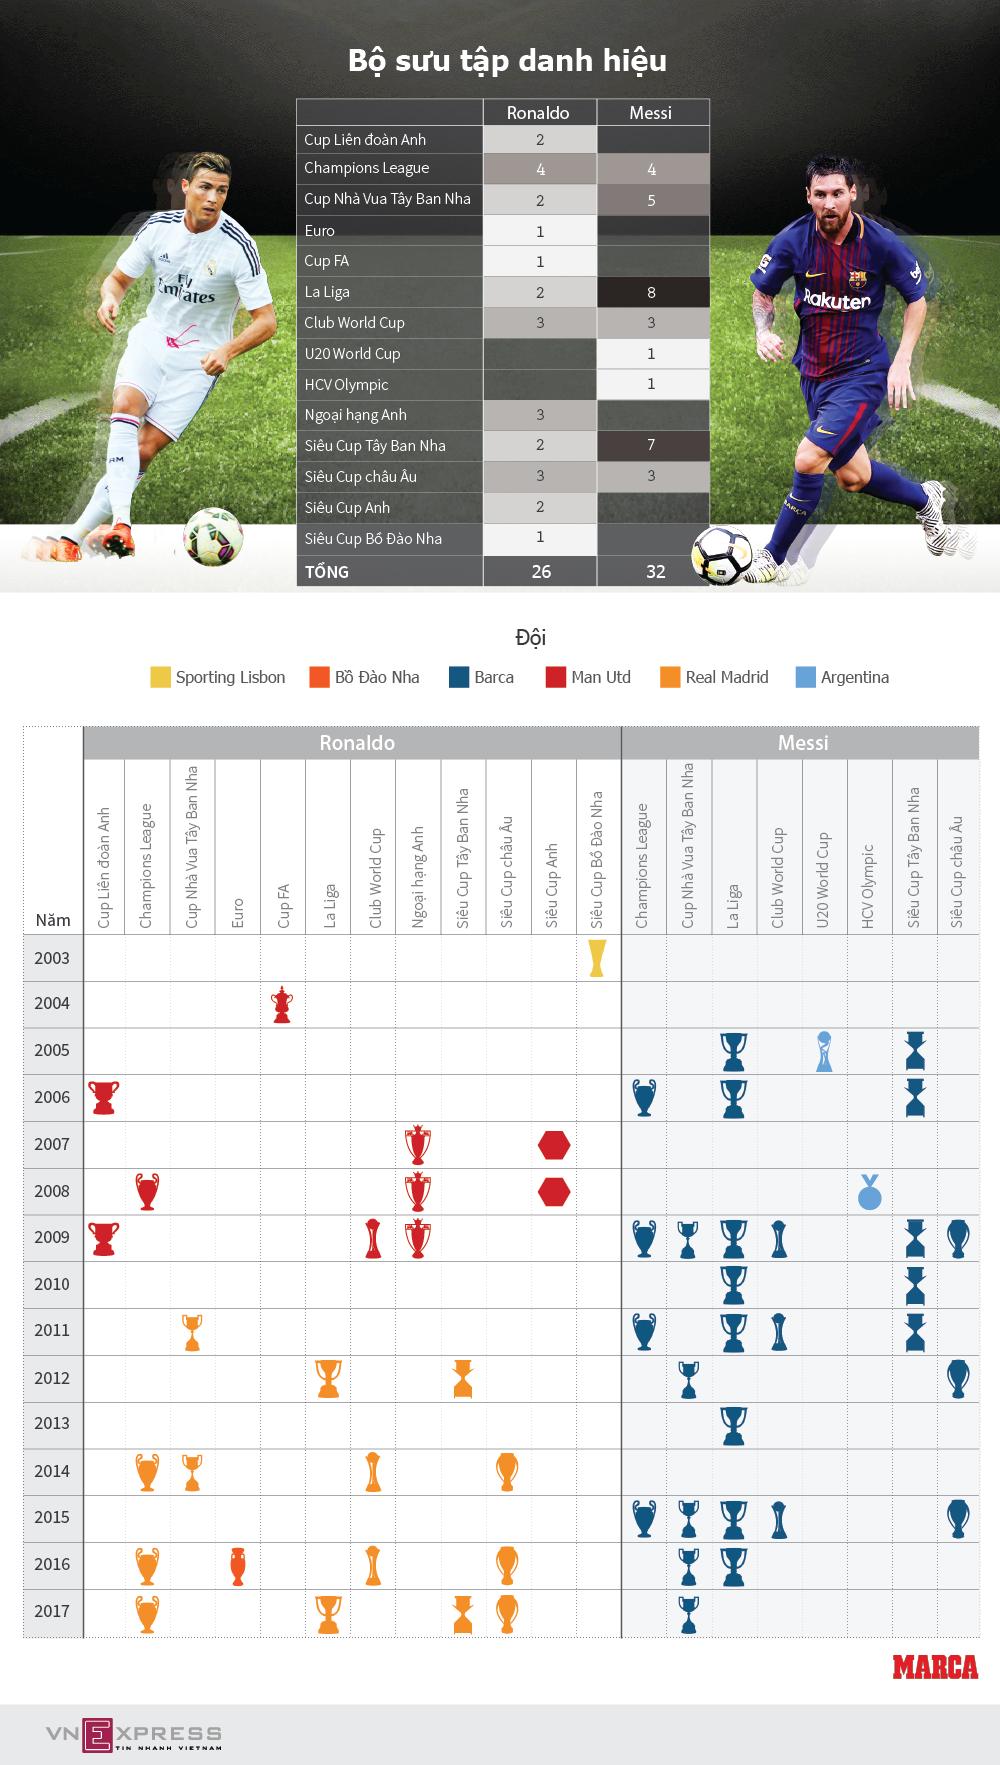 Cuộc đua danh hiệu giữa Ronaldo và Messi